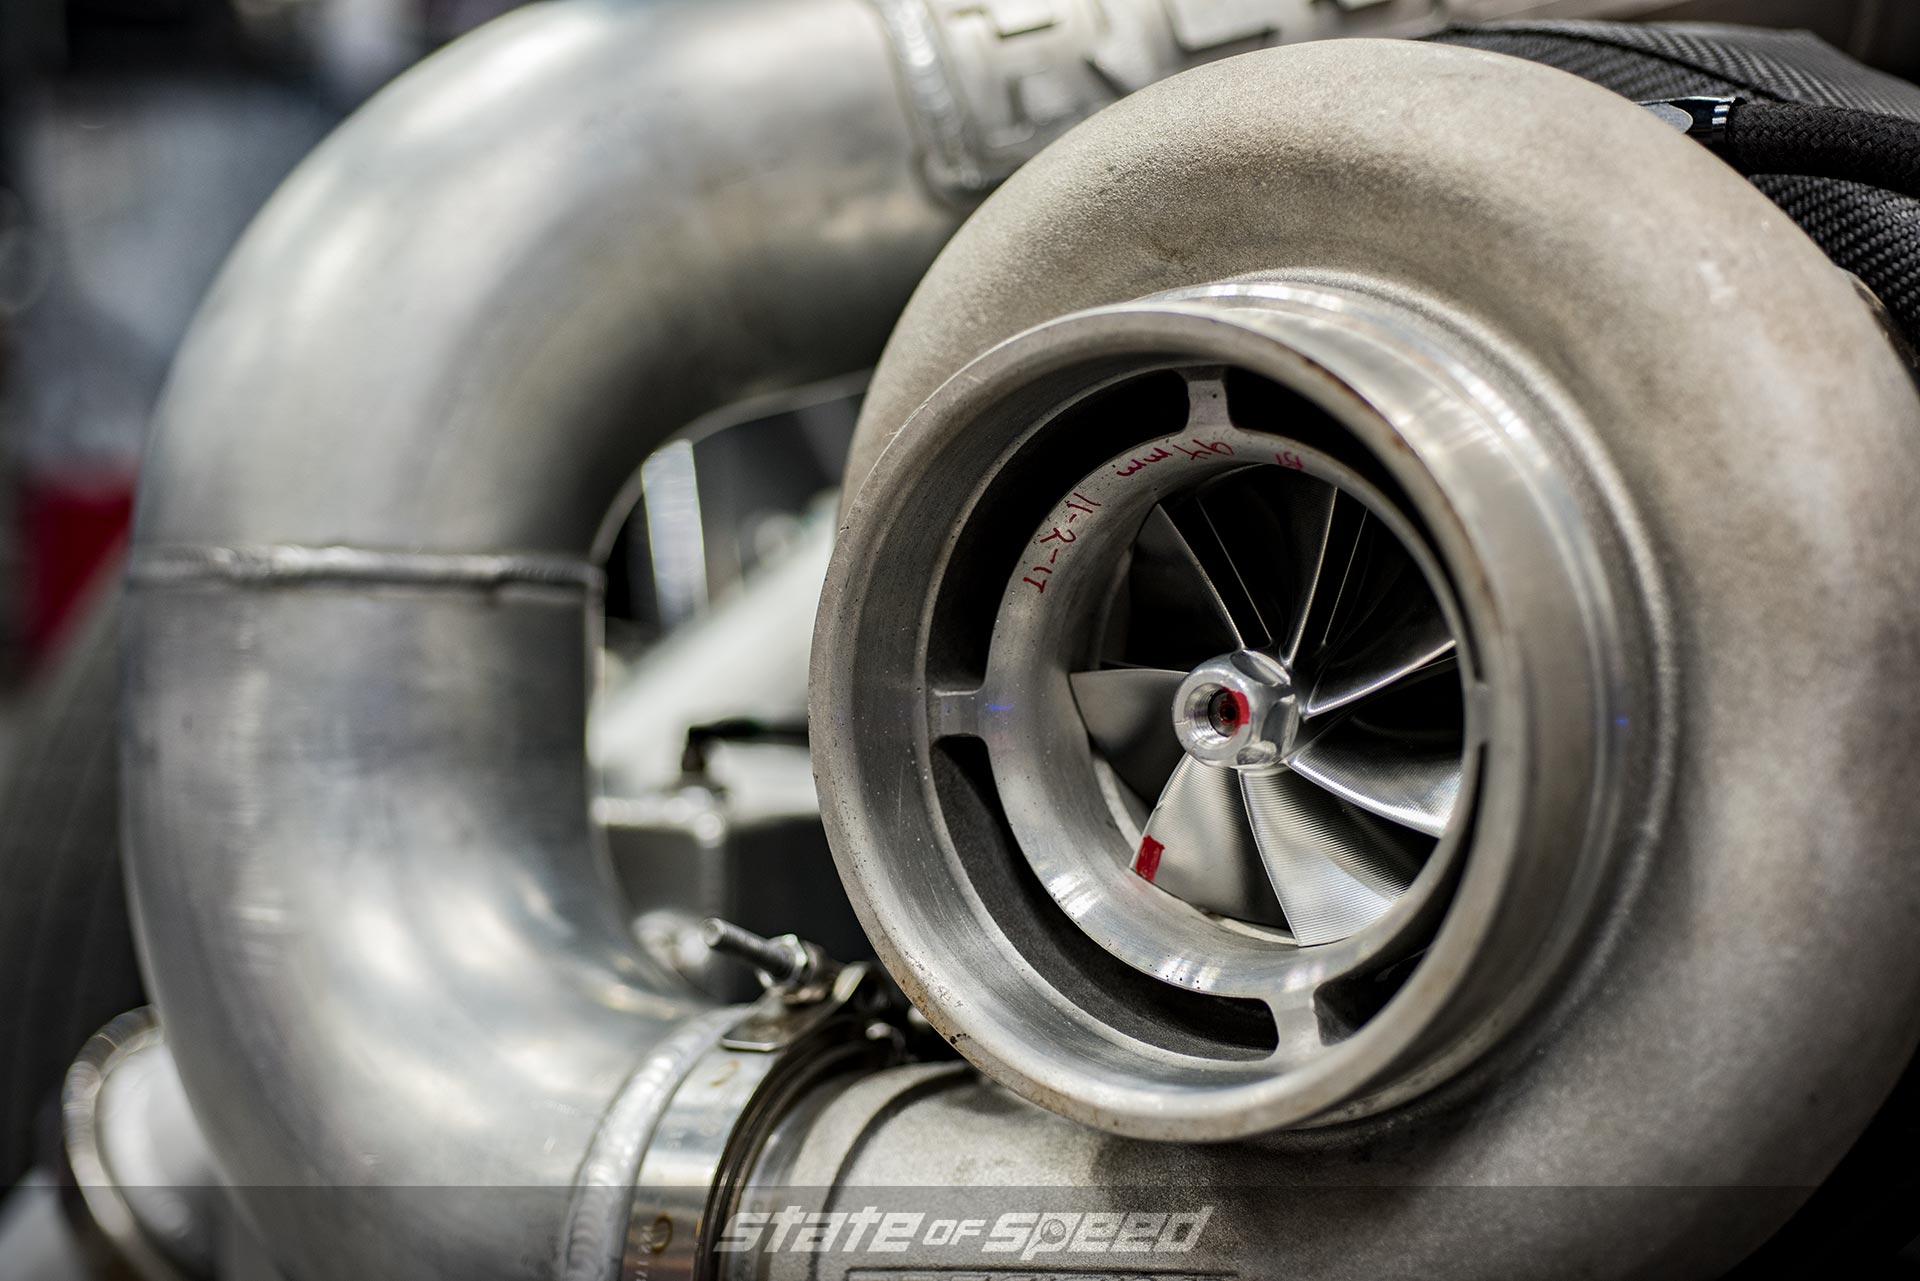 Closeup of a turbocharger